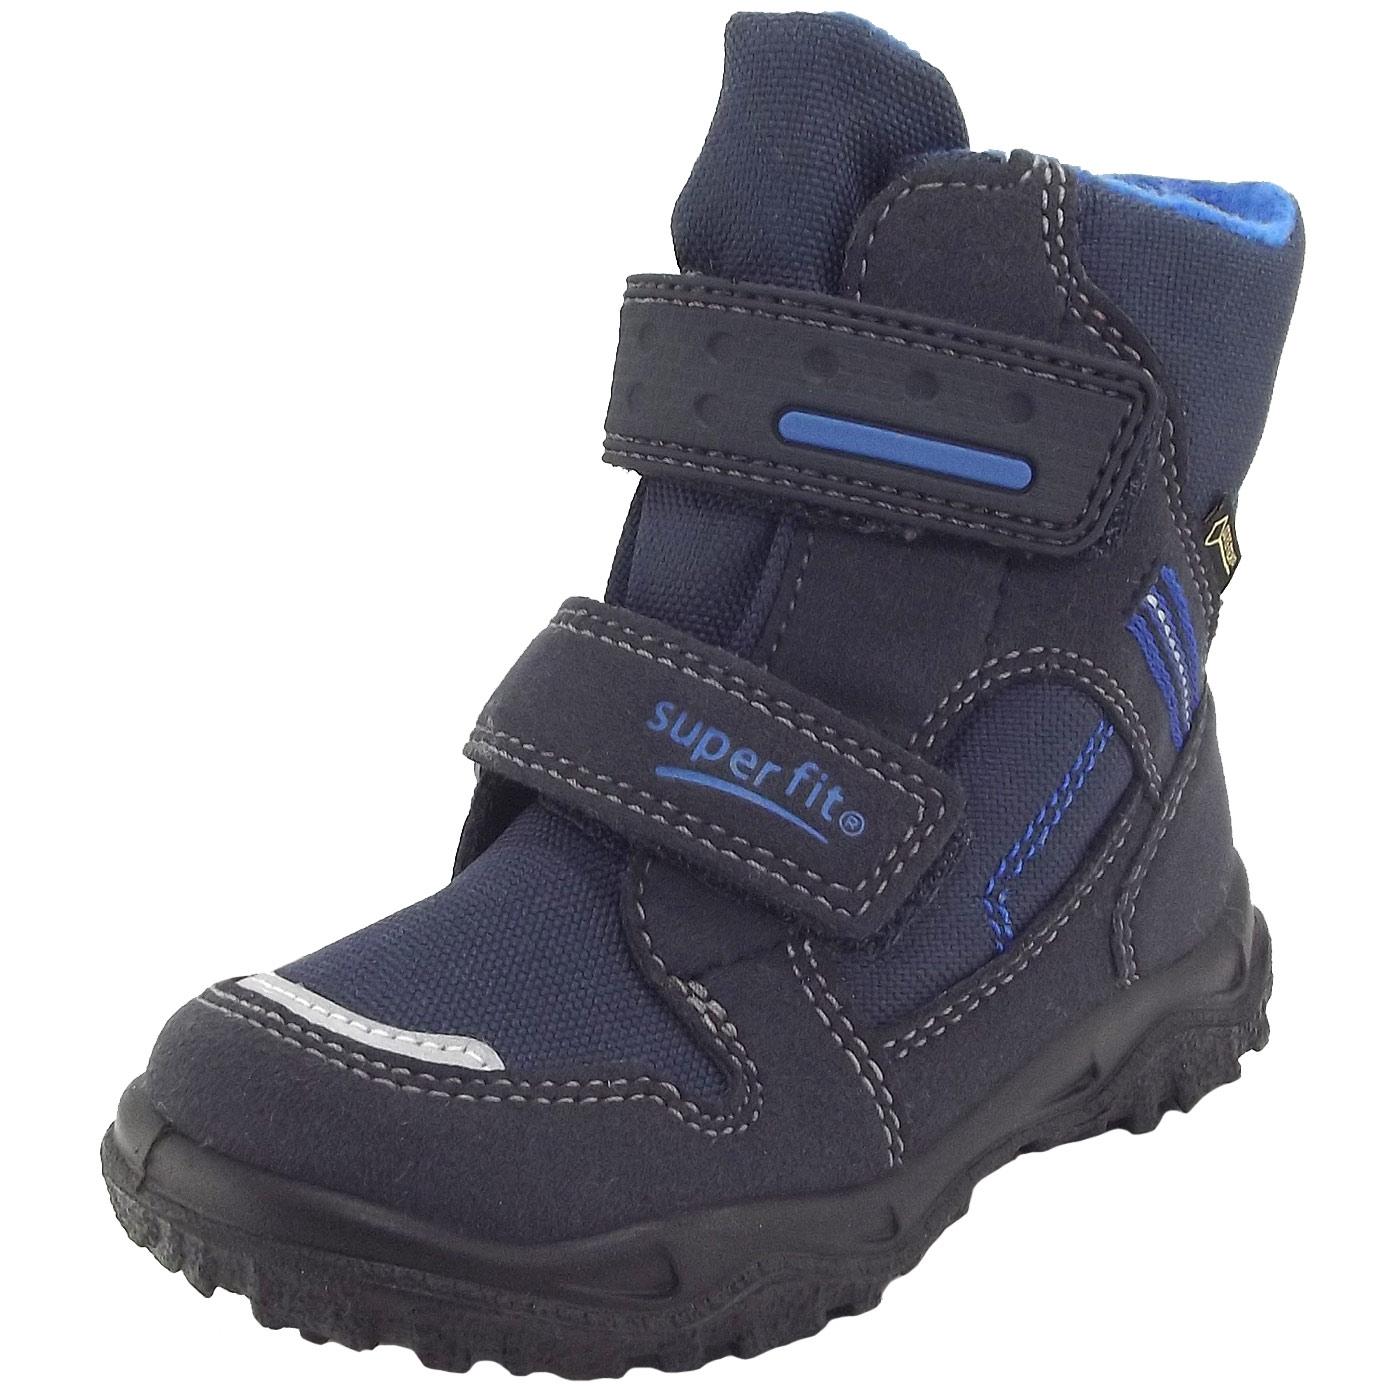 3990cd02f6fd91 Superfit Gore-Tex Husky1 Klett dunkelblau blau (ocean kombi)